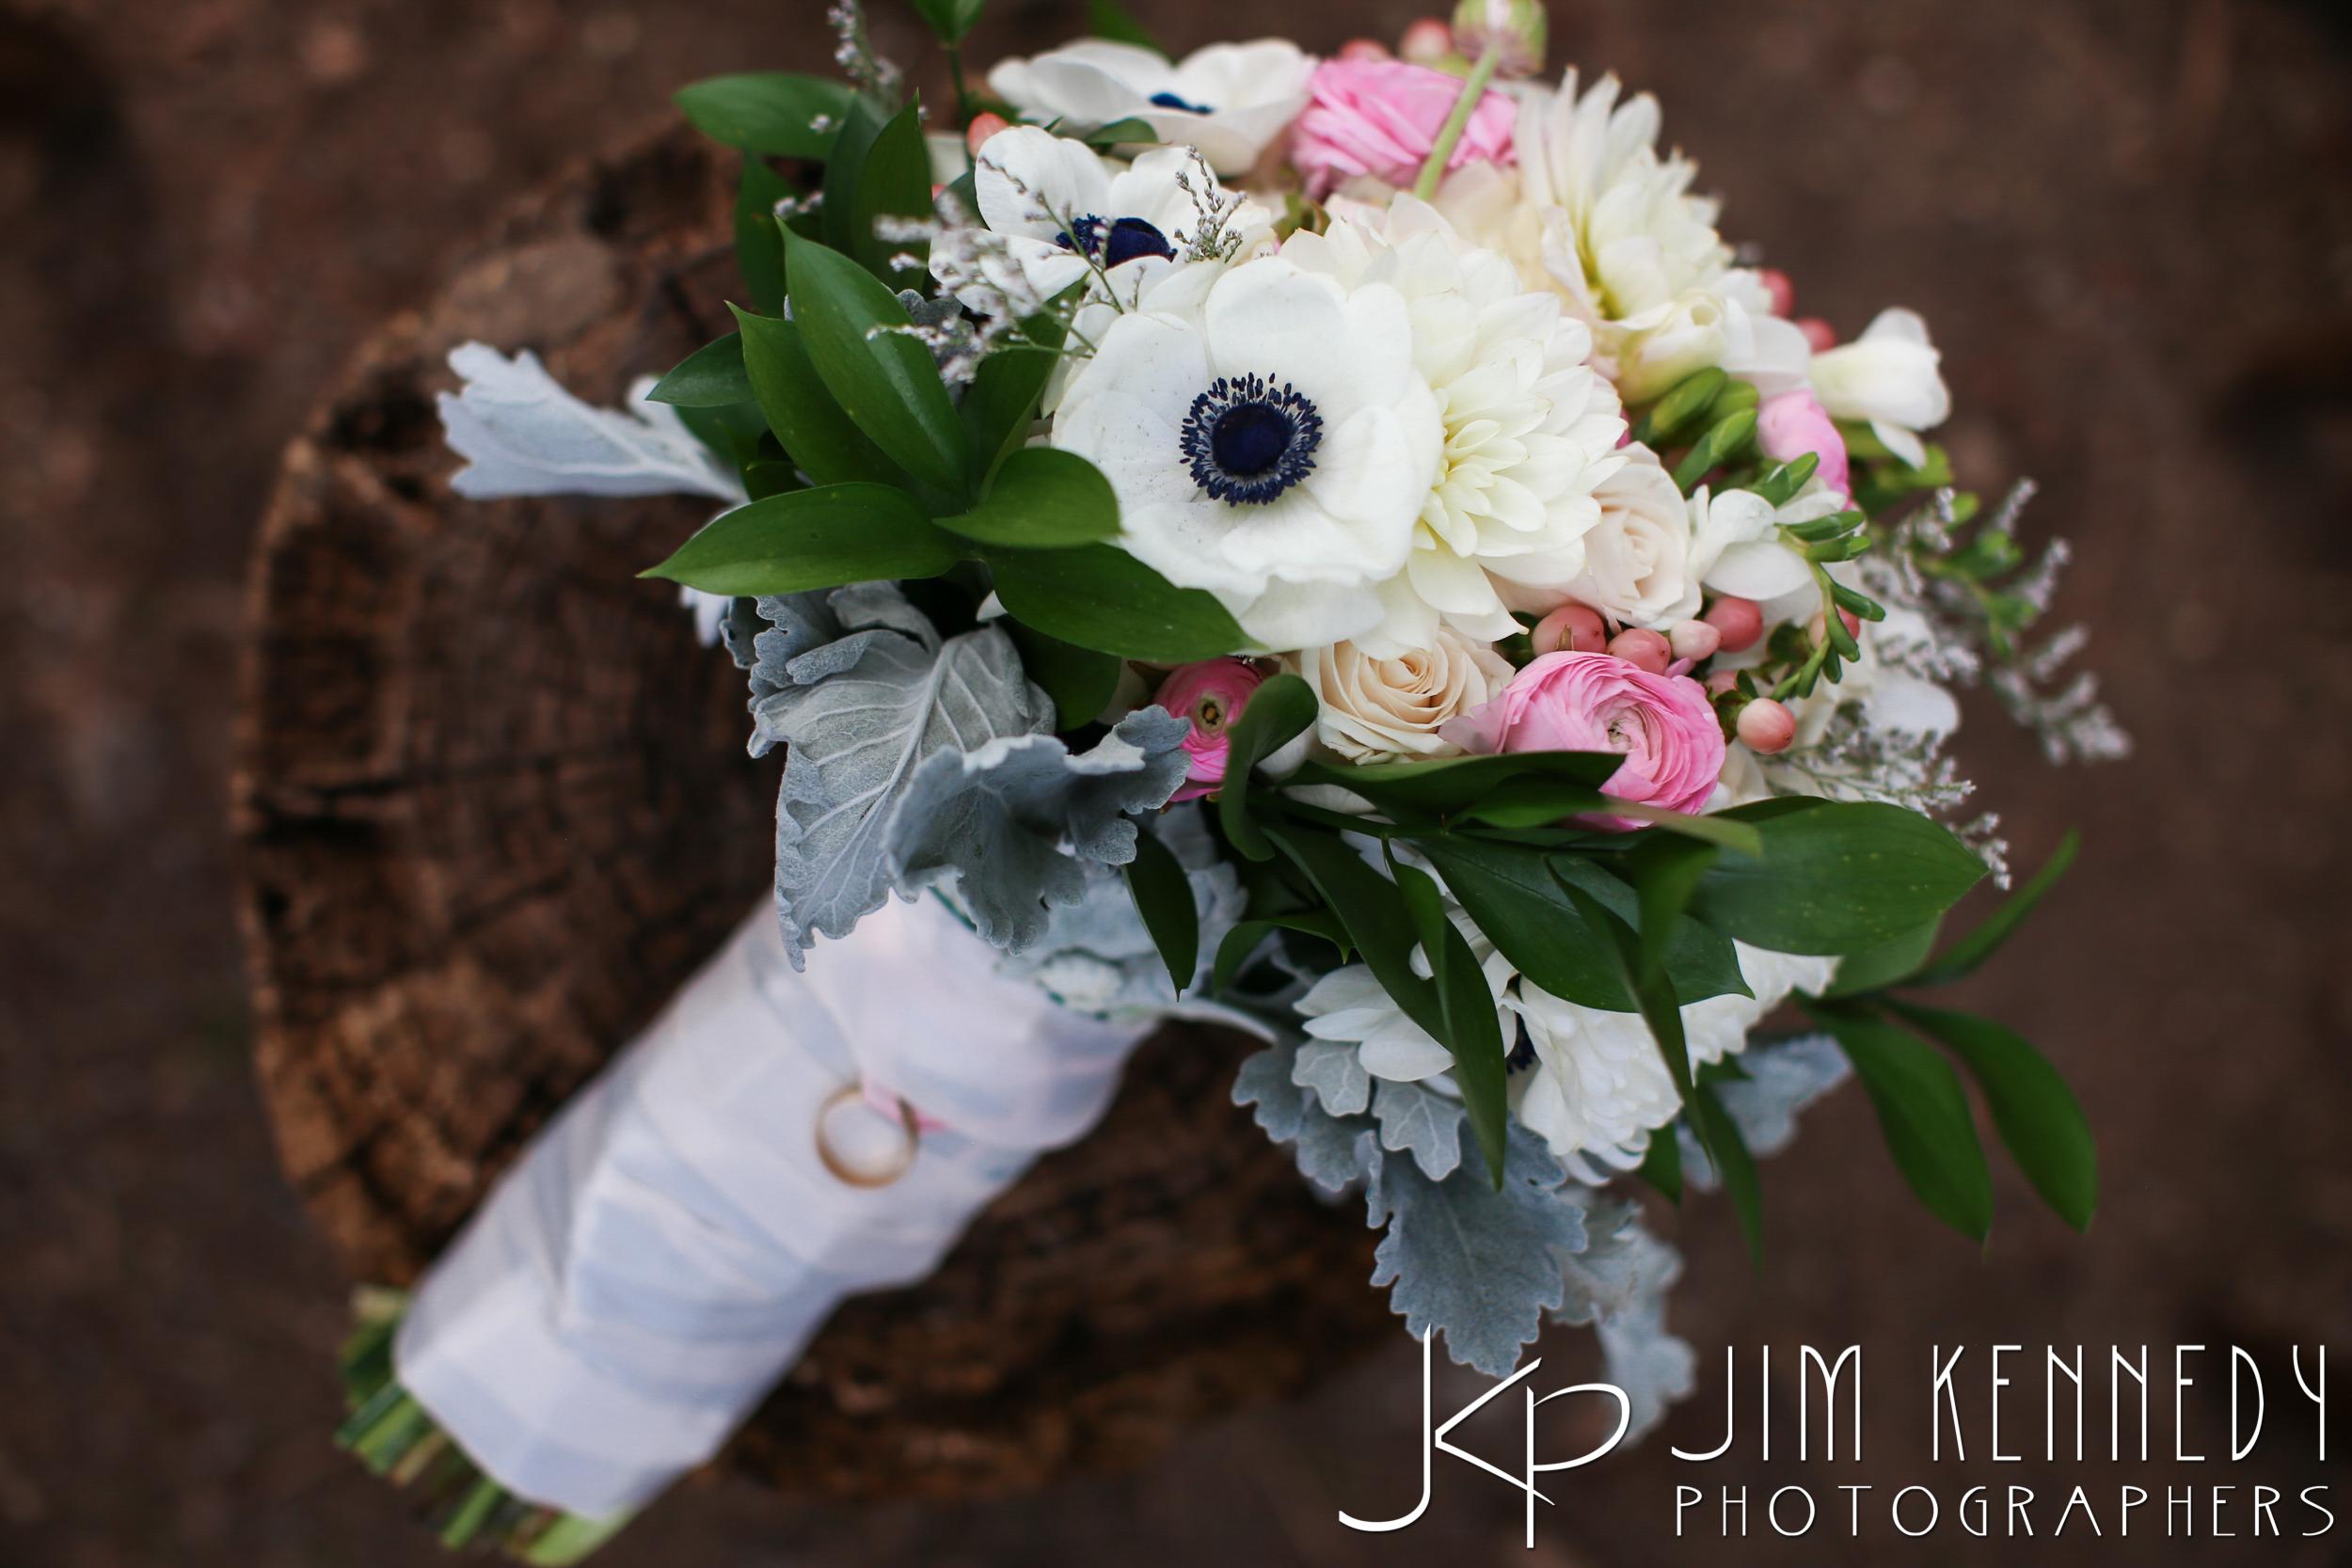 jim_kennedy_photographers_highland_springs_wedding_caitlyn_0009.jpg